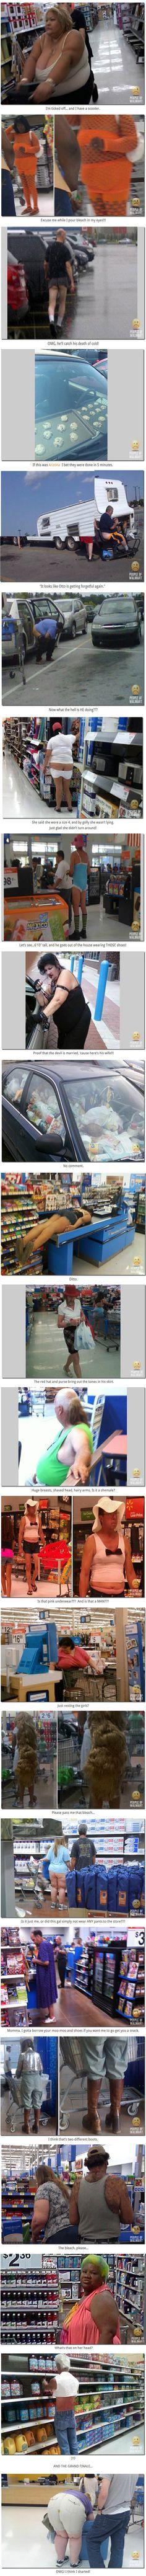 The Best (or Worst?) of the People of Walmart - Part 4 | Boo Fckm HooBoo Fckm Hoo